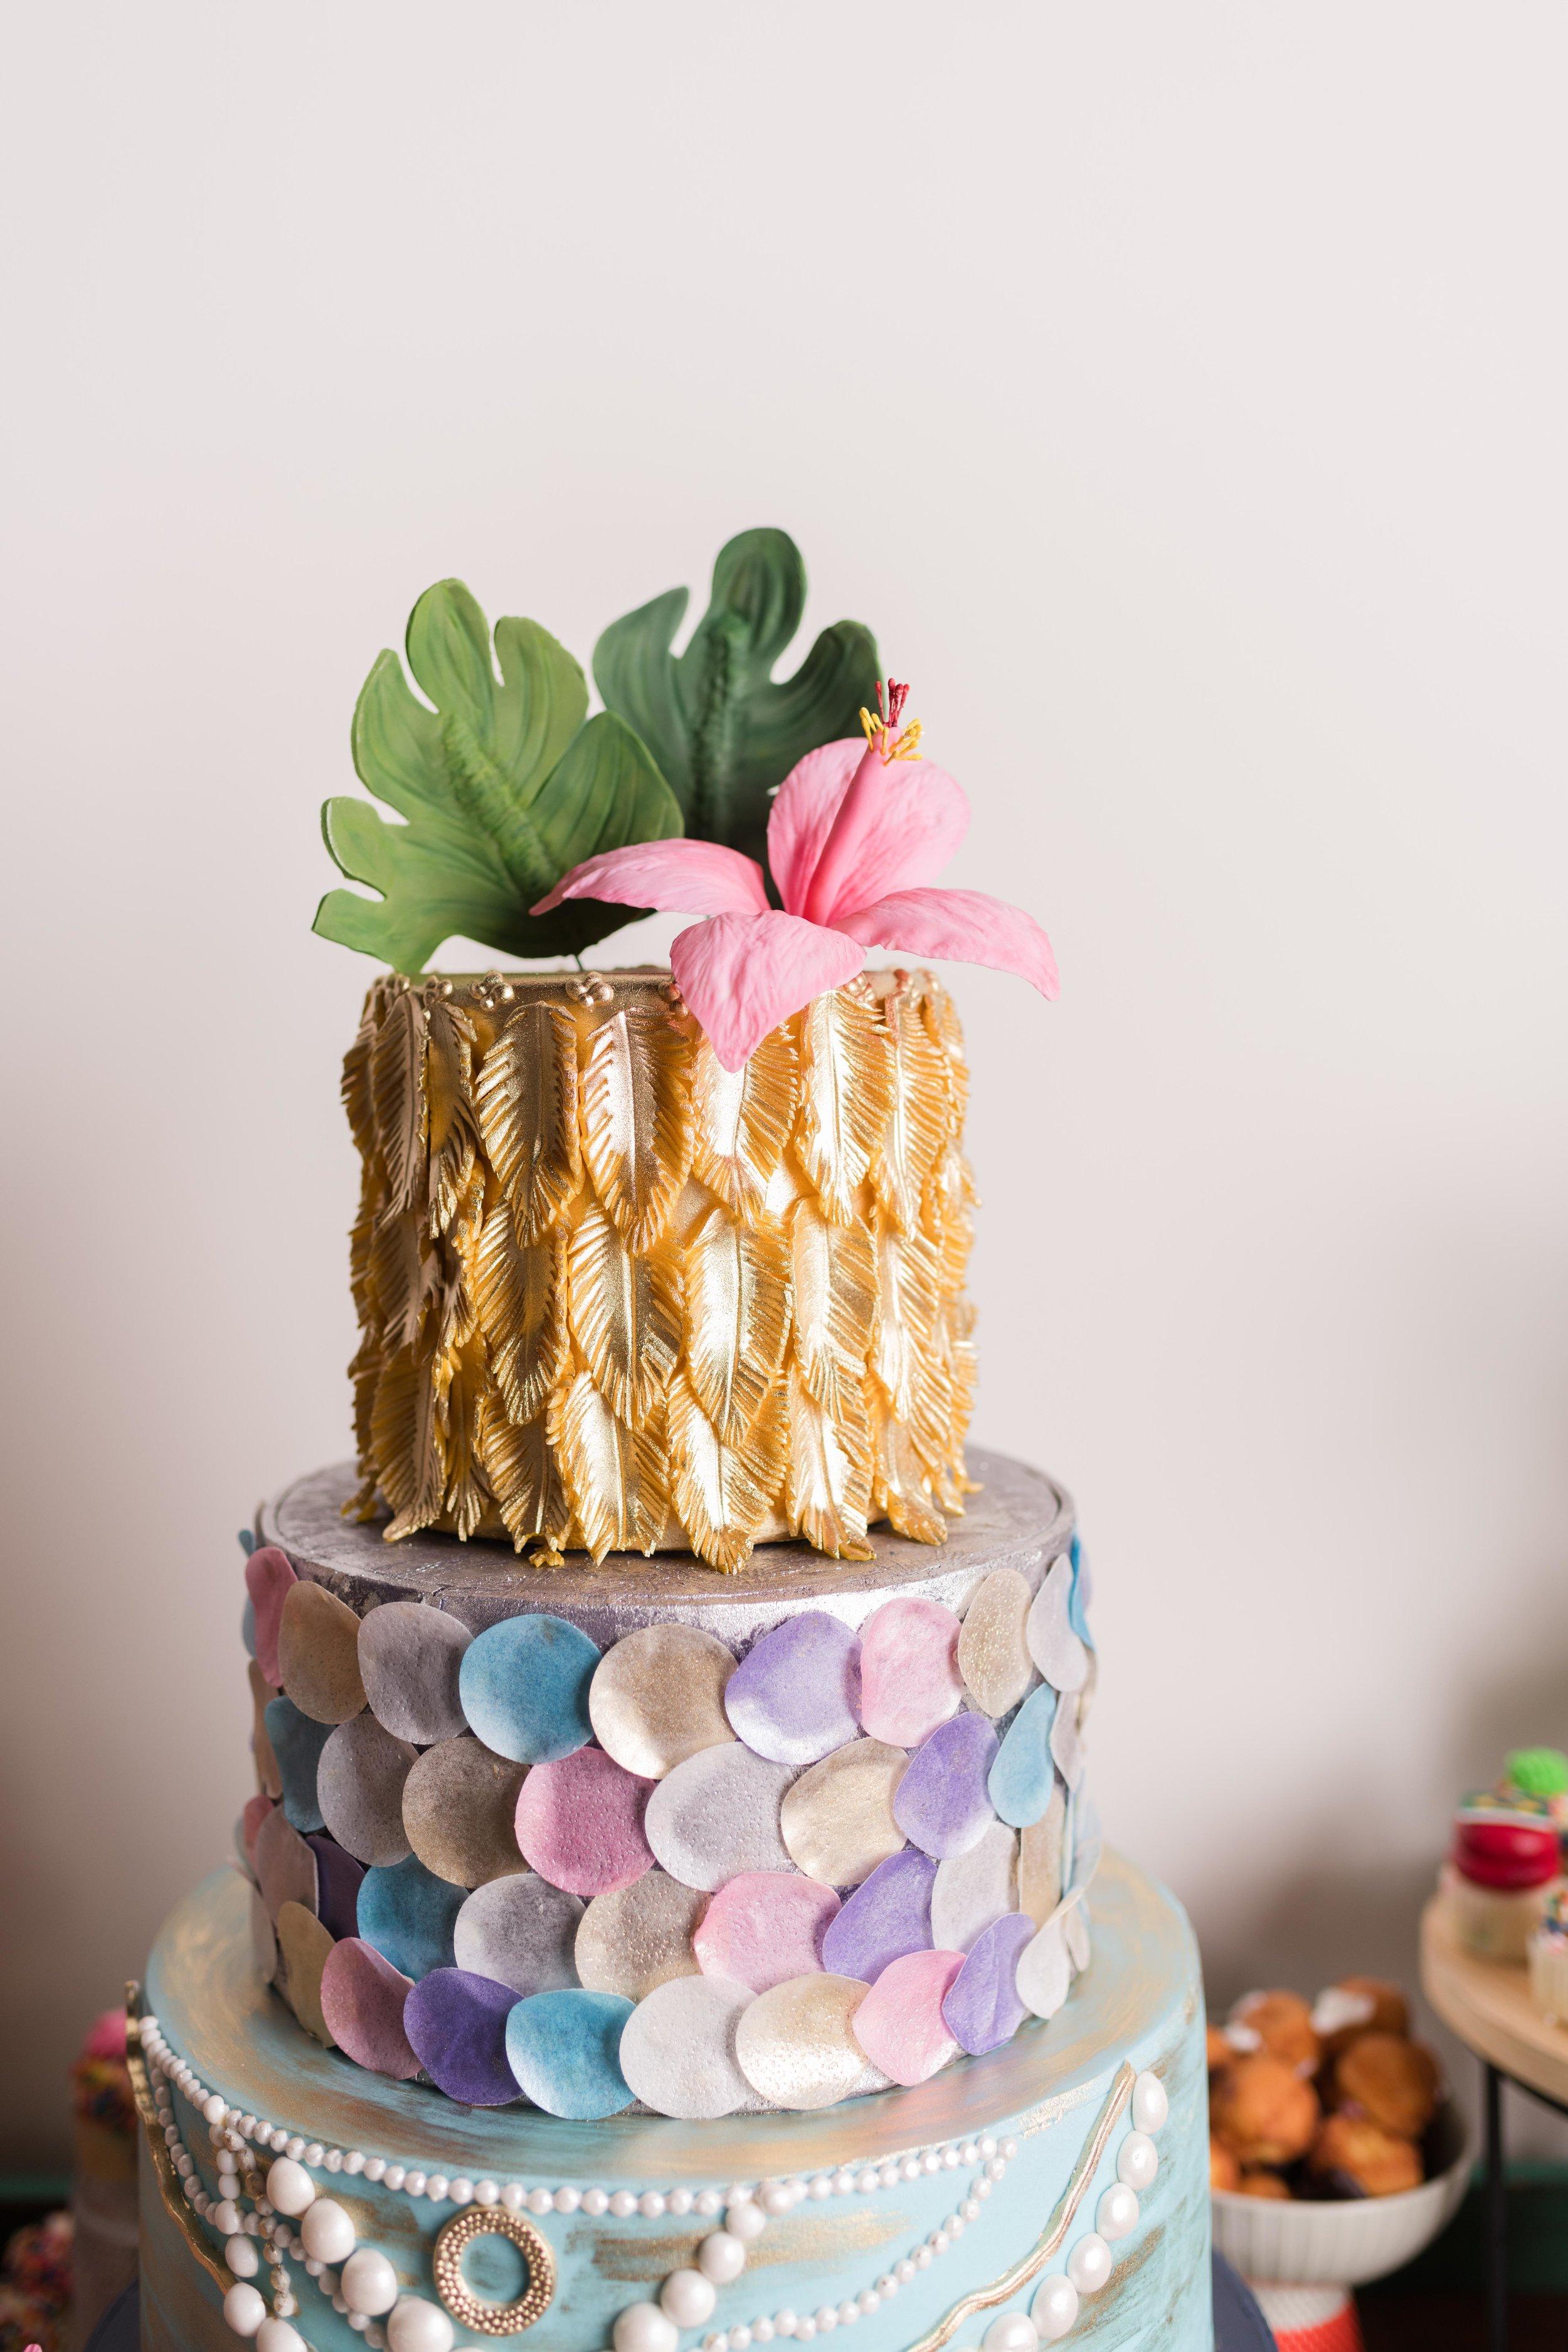 Carnaval Wedding Shoot Clyde Venue-tropical-wedding-cake-tropical-wedding-inspiration-ivory-and-beau-colorful-wedding-cake-unique-wedding-cake-inspiration-savannah-wedding-planner-event-designerjpg.jpg